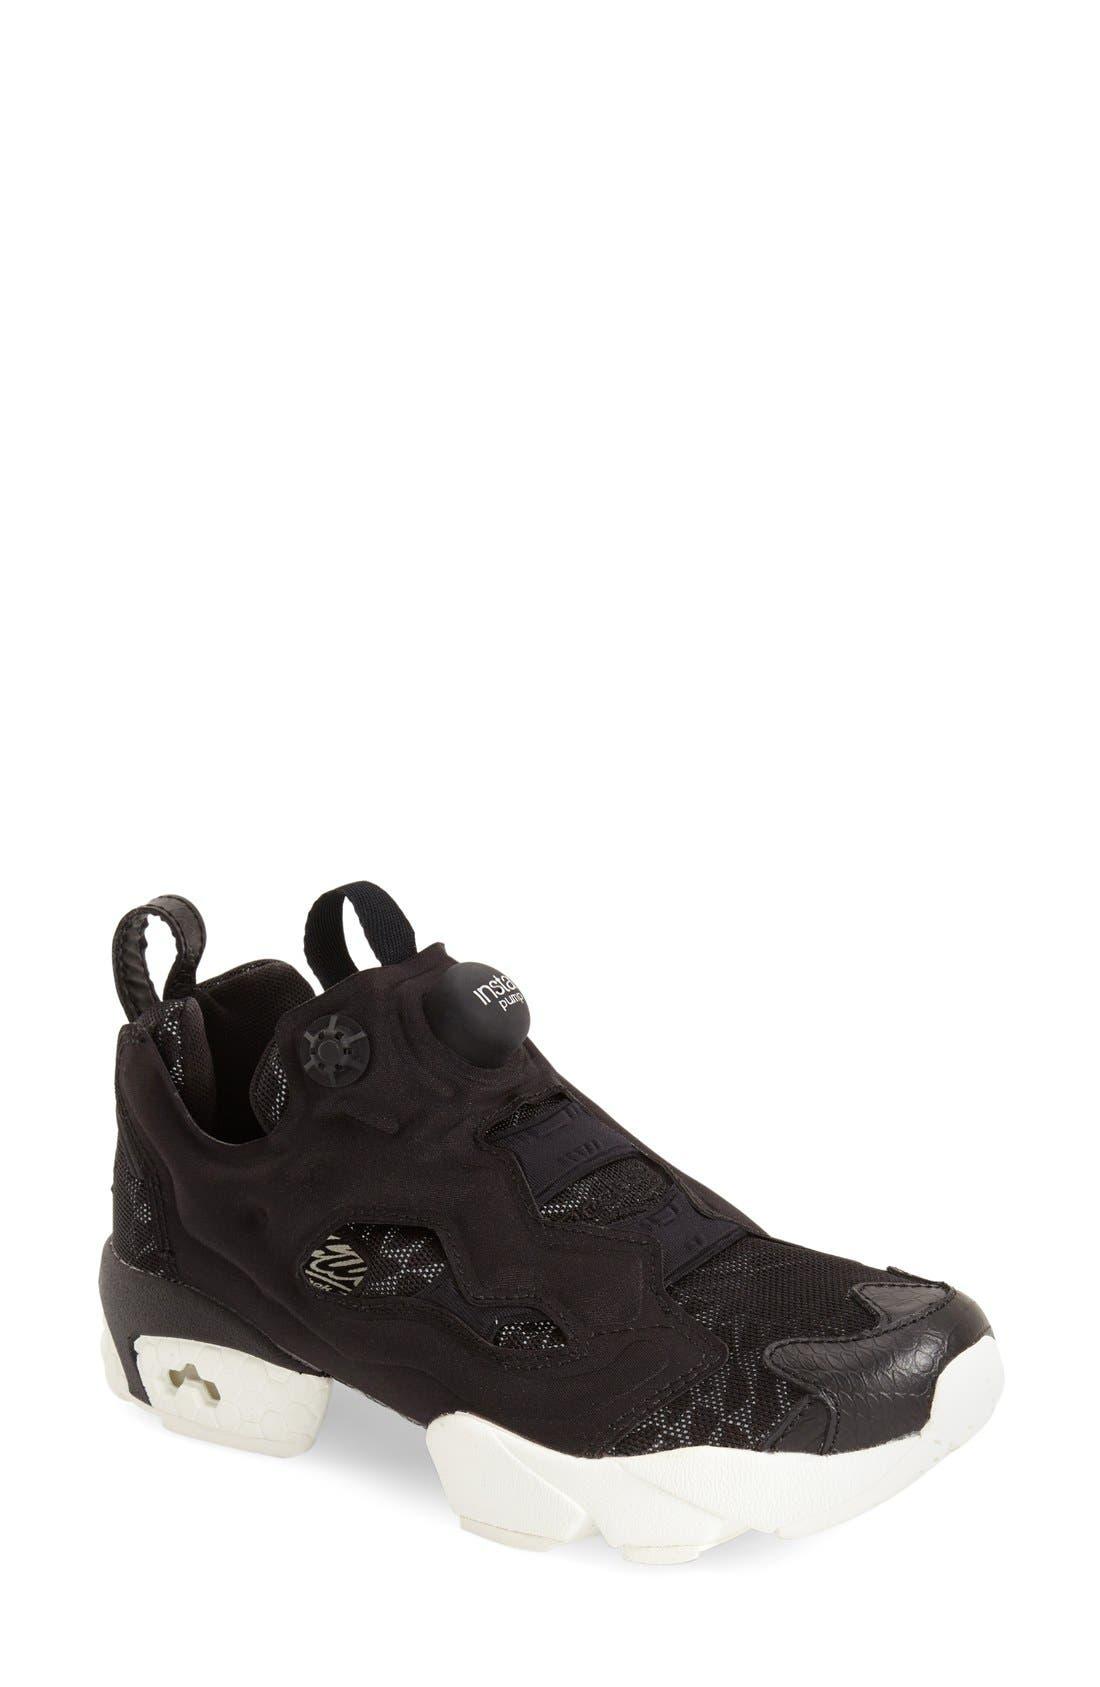 'Instapump Fury Tech' Sneaker, Main, color, 001